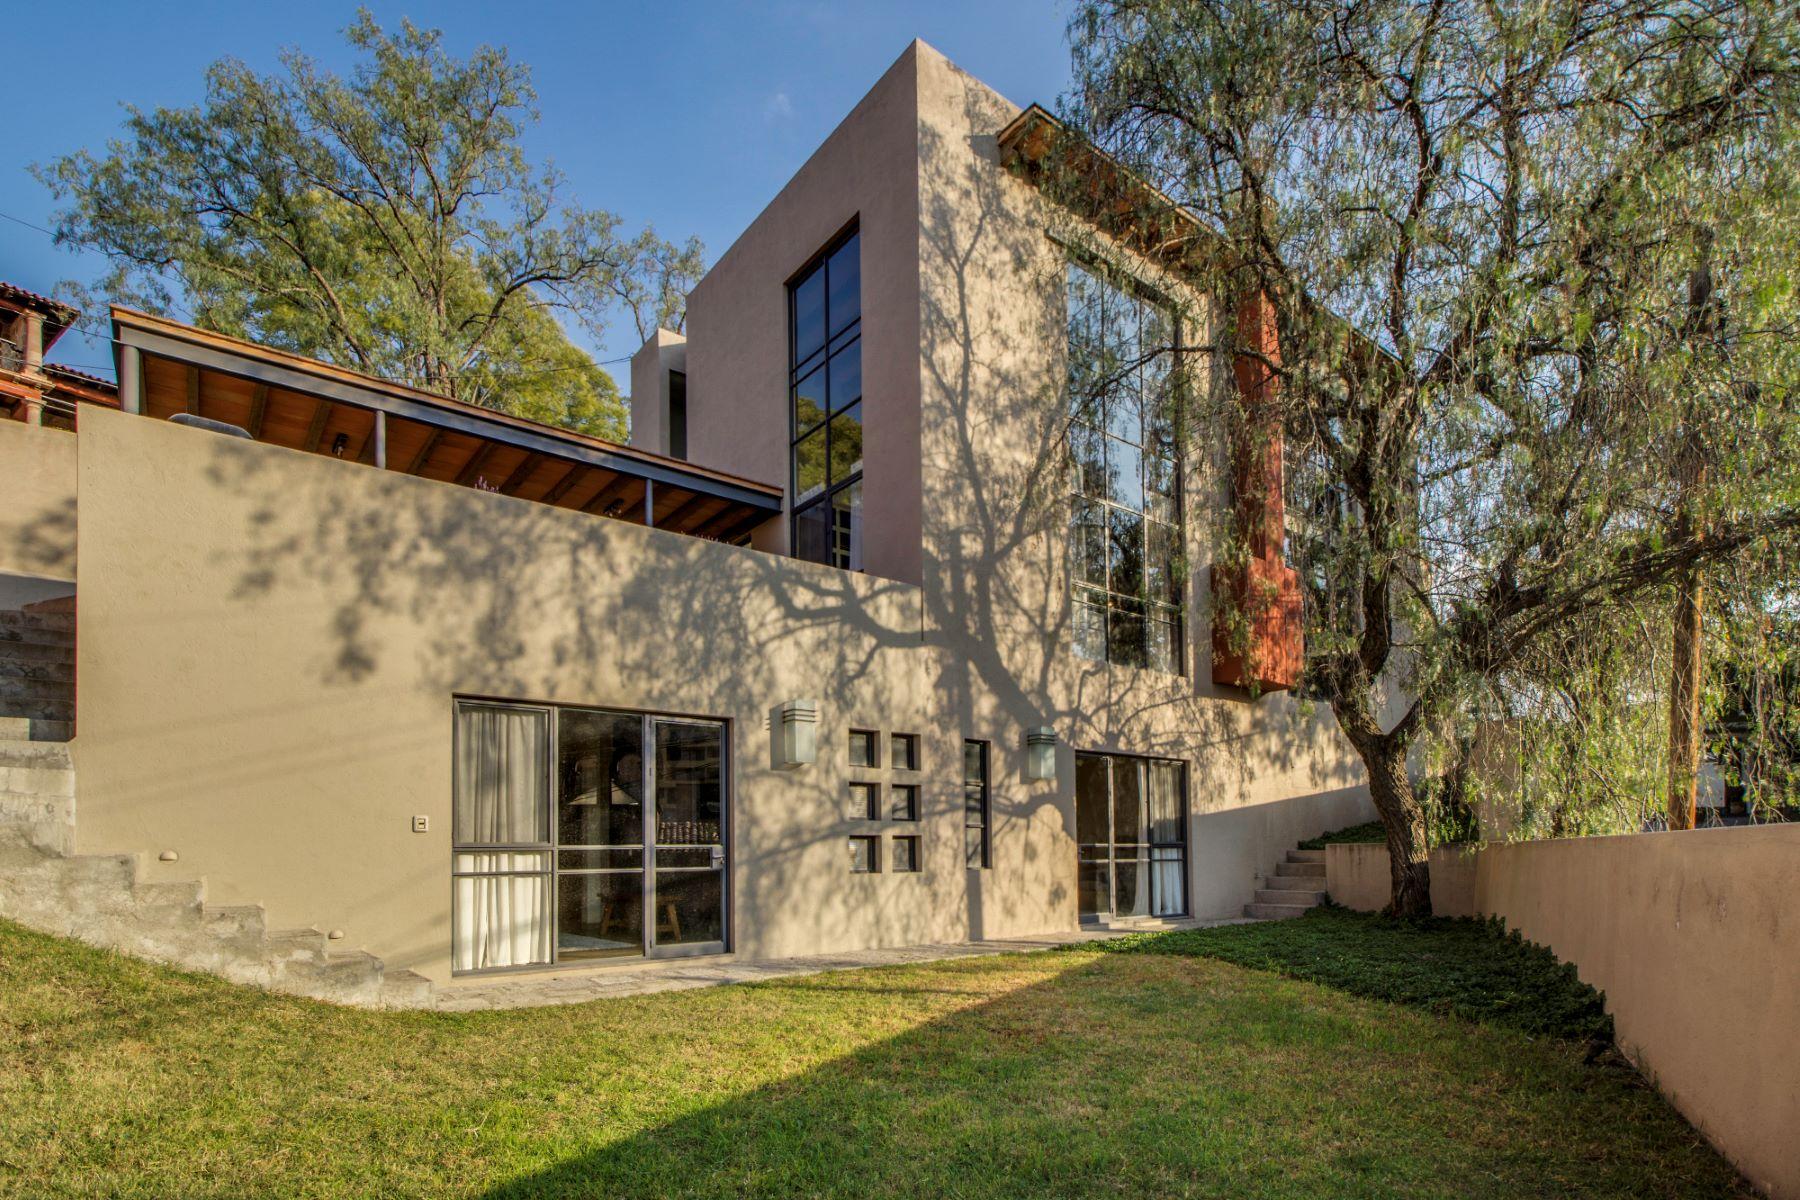 Additional photo for property listing at Casa Faroles Faroles 1 San Miguel De Allende, Guanajuato 37700 México